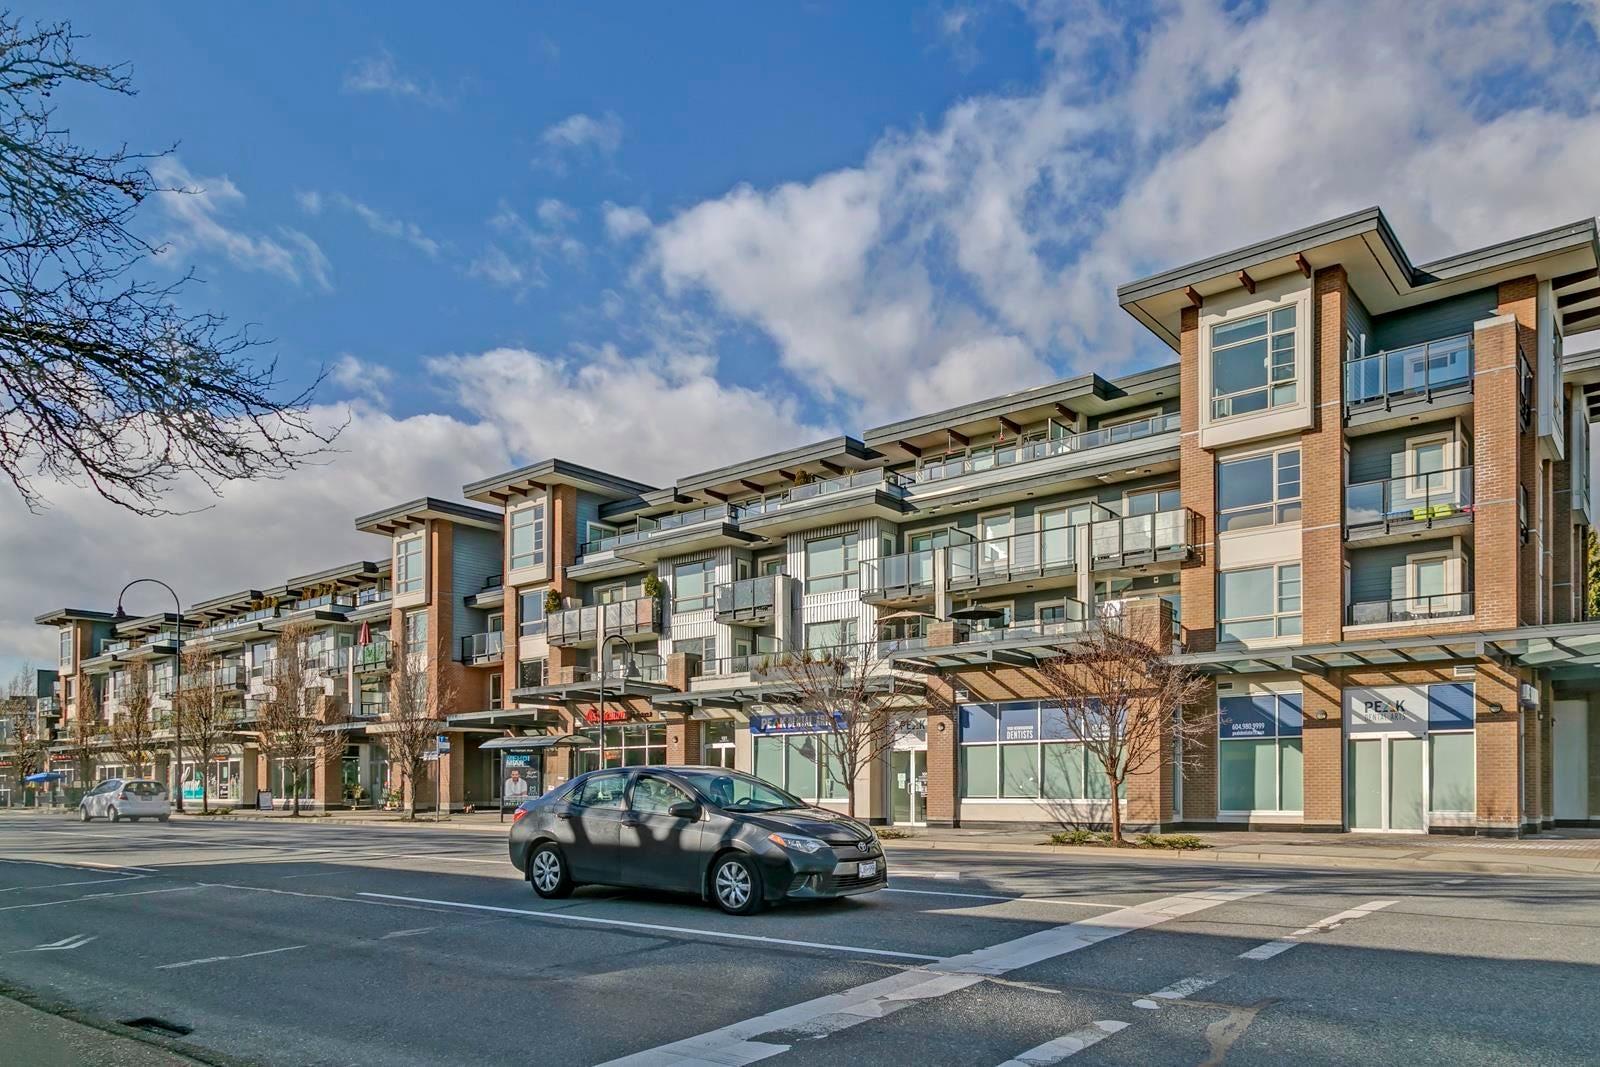 312 1330 MARINE DRIVE - Pemberton NV Apartment/Condo for sale, 2 Bedrooms (R2607215) - #1